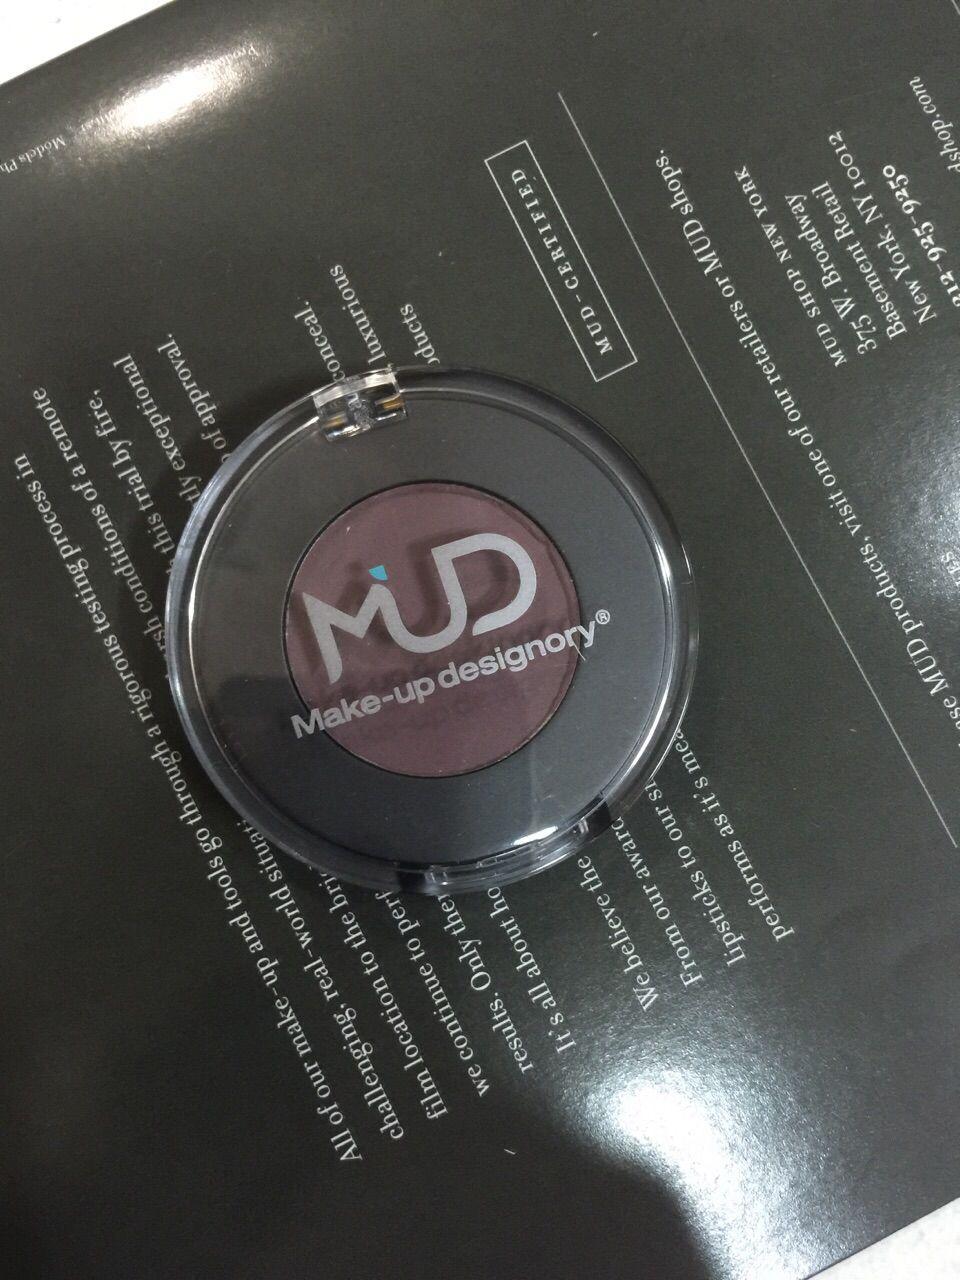 Pin by Benton Makeup Academy on MUD Makeup DESIGNORY Mud